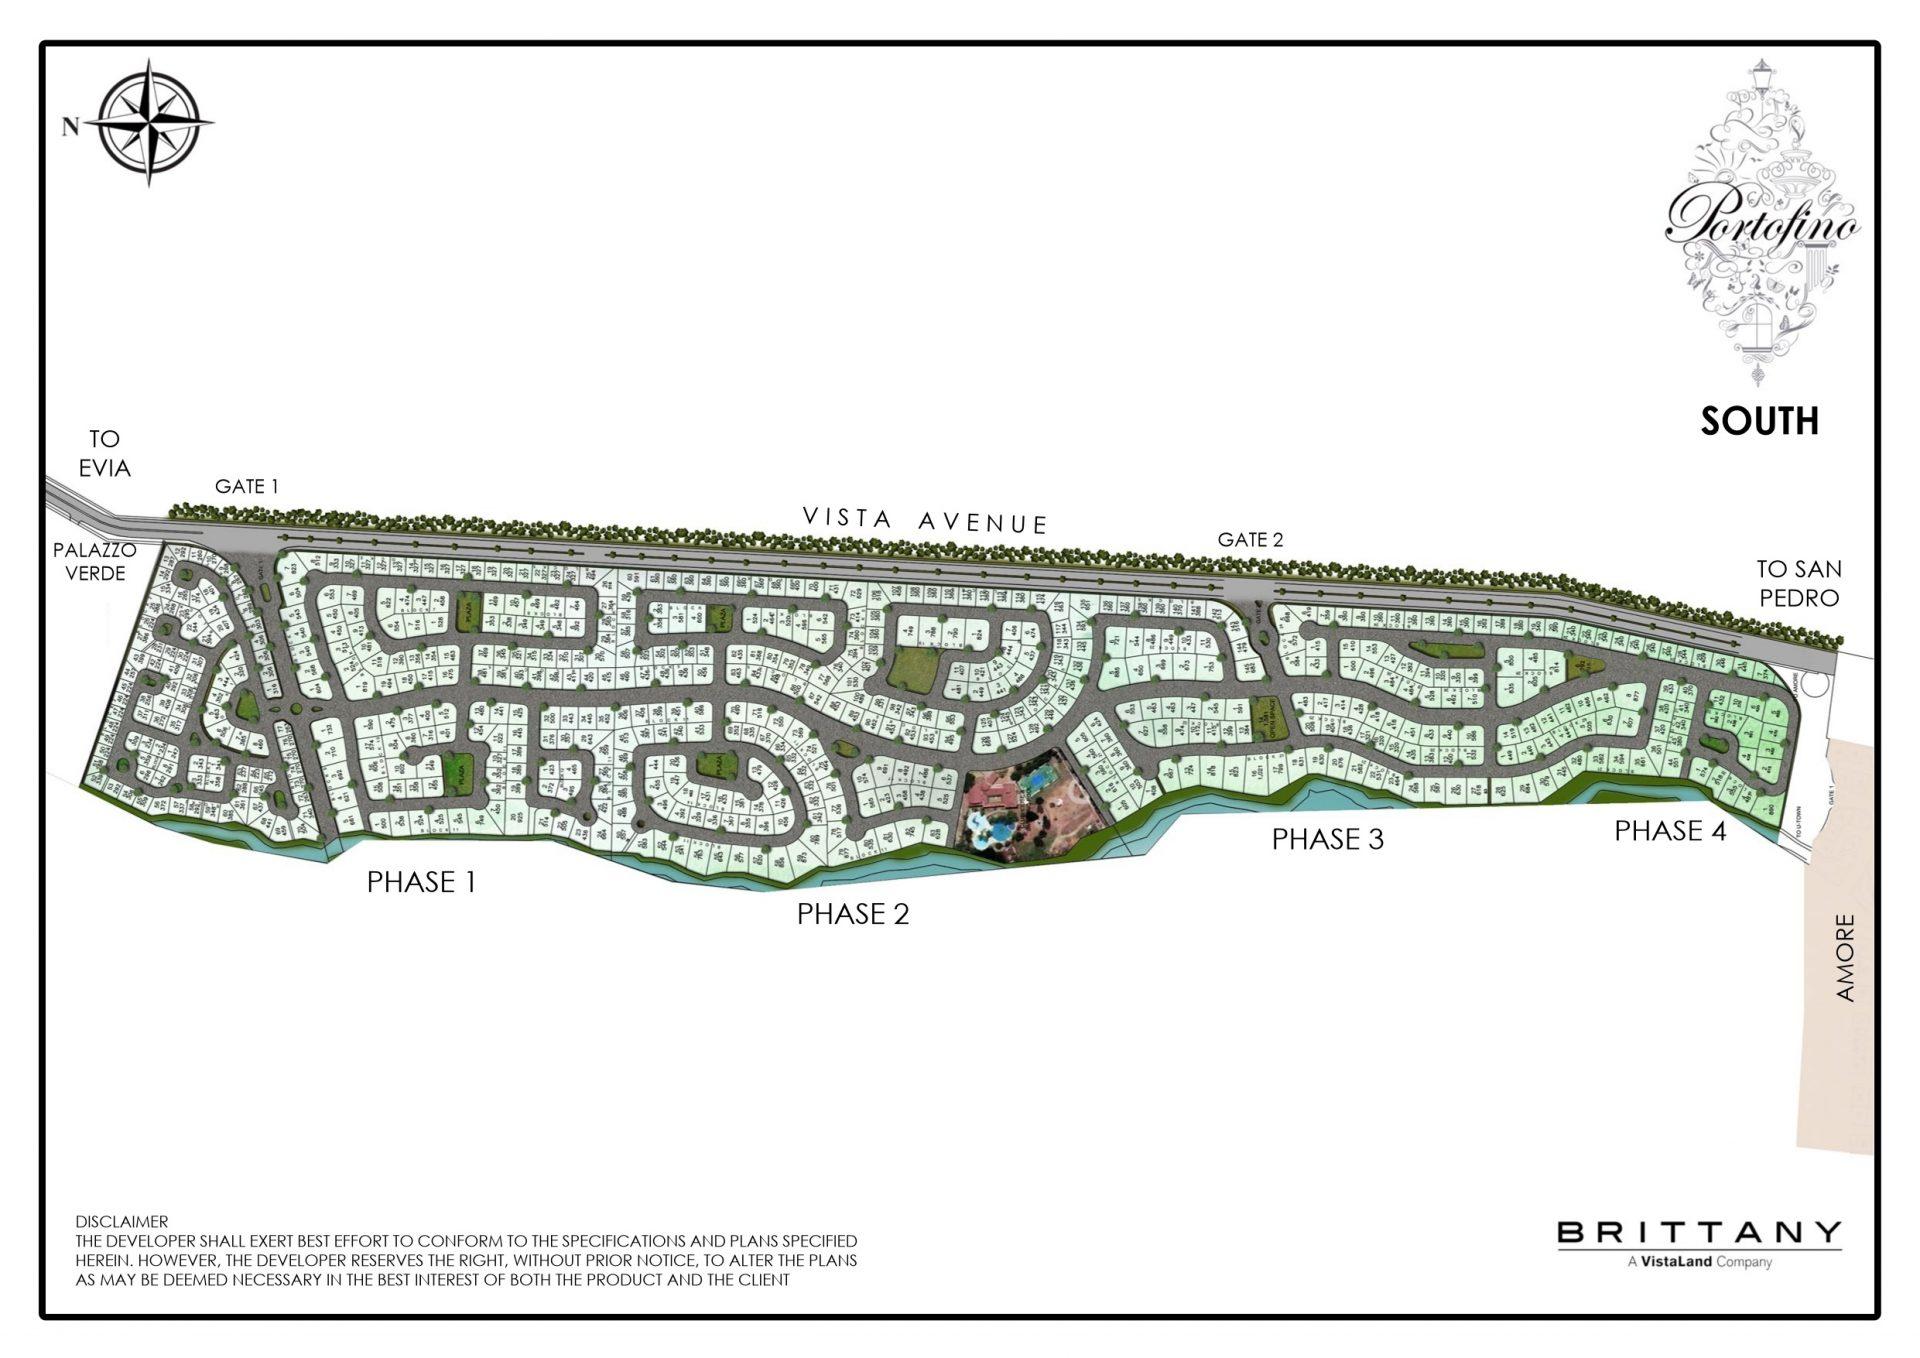 Portofino South - Portofino South Site Development Plan - Master Plan Vista Alabang - Brittany Corporation